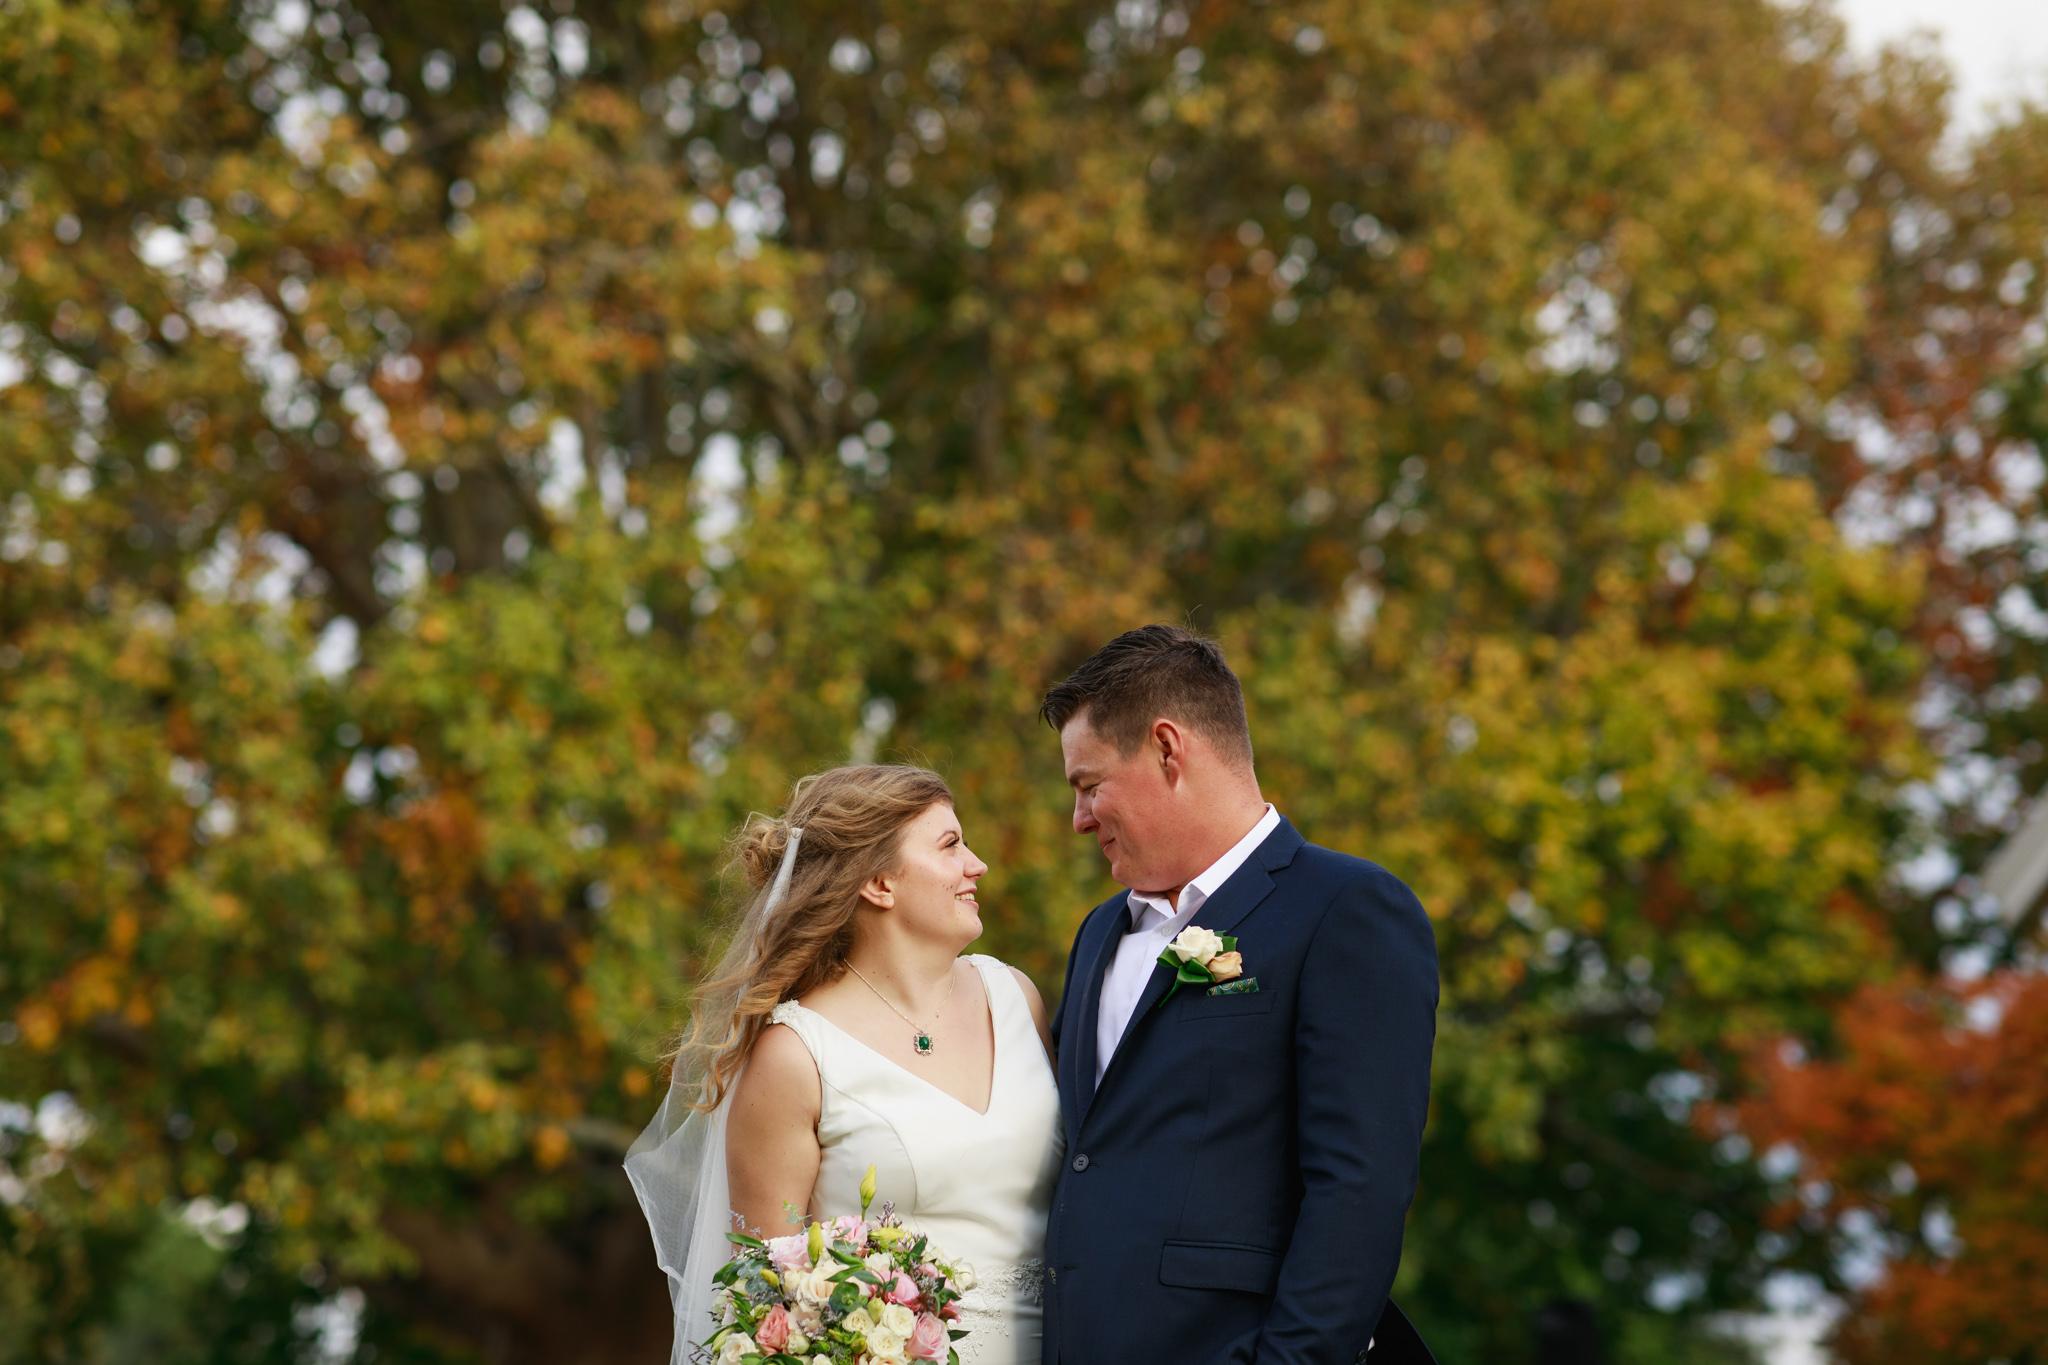 palmerston-north-wedding-photography-caccia-birch-highlight-new-zealand.jpg